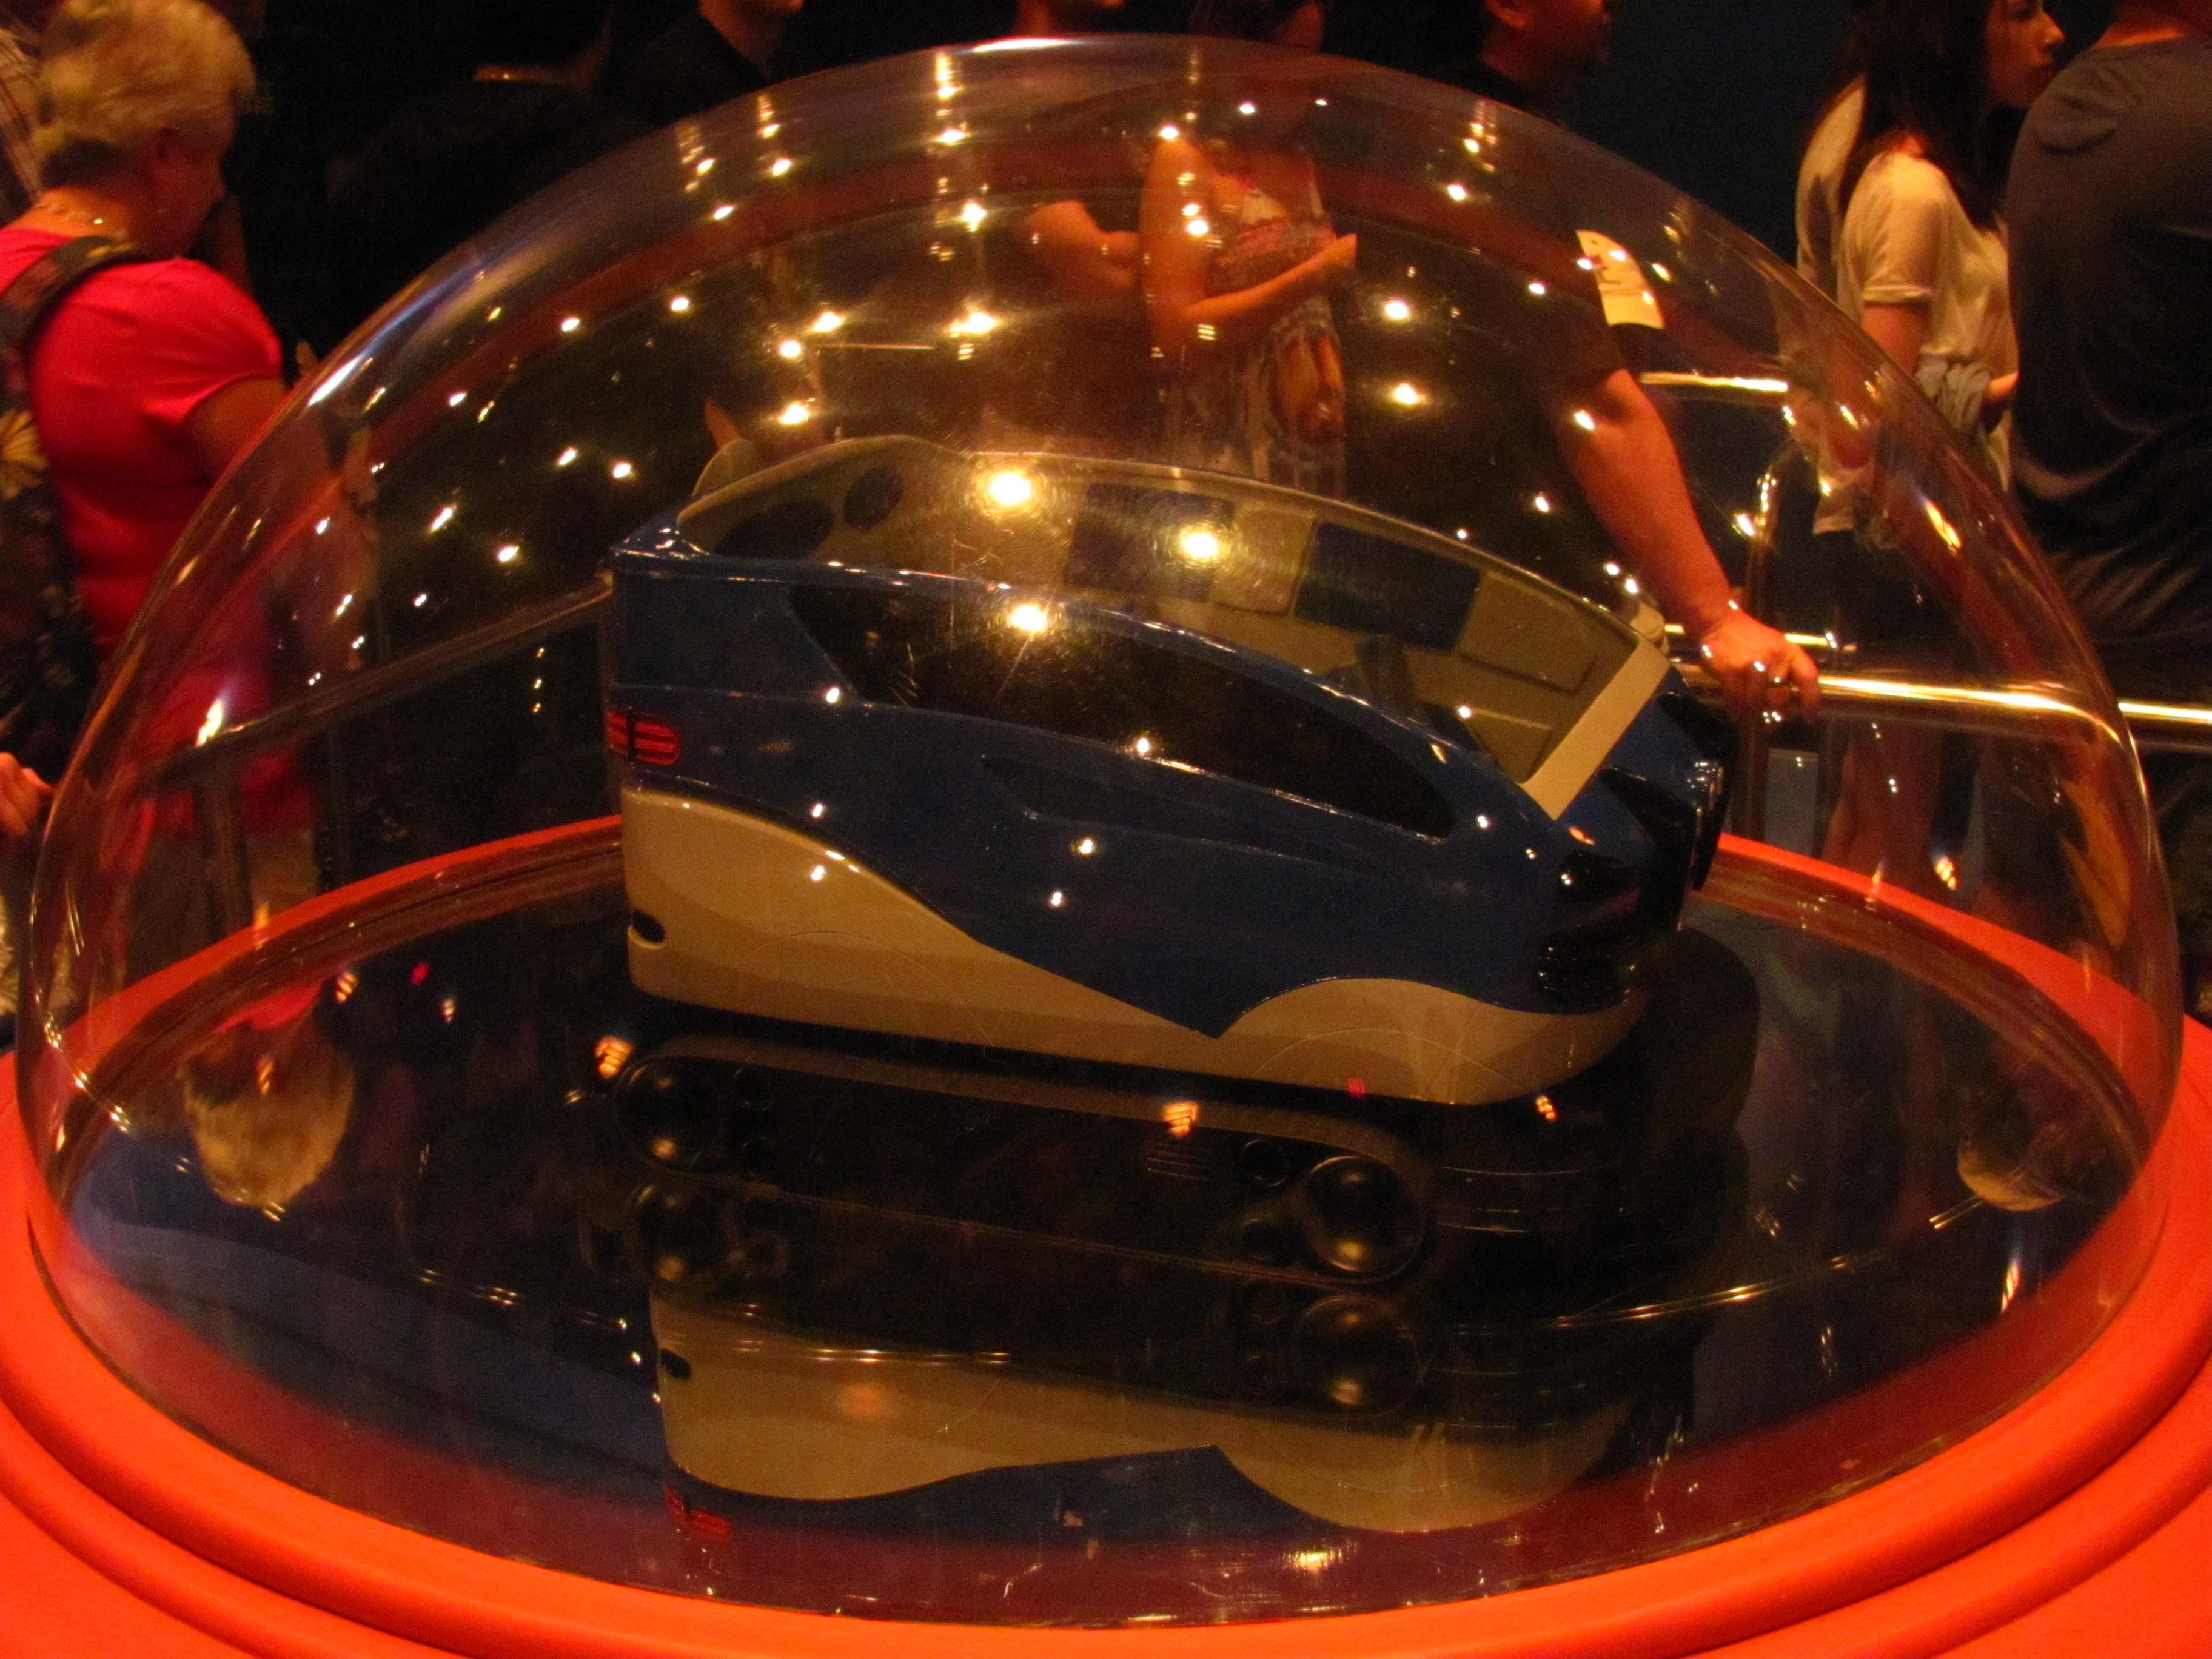 filethe amazing adventures of spiderman vehicle model 1